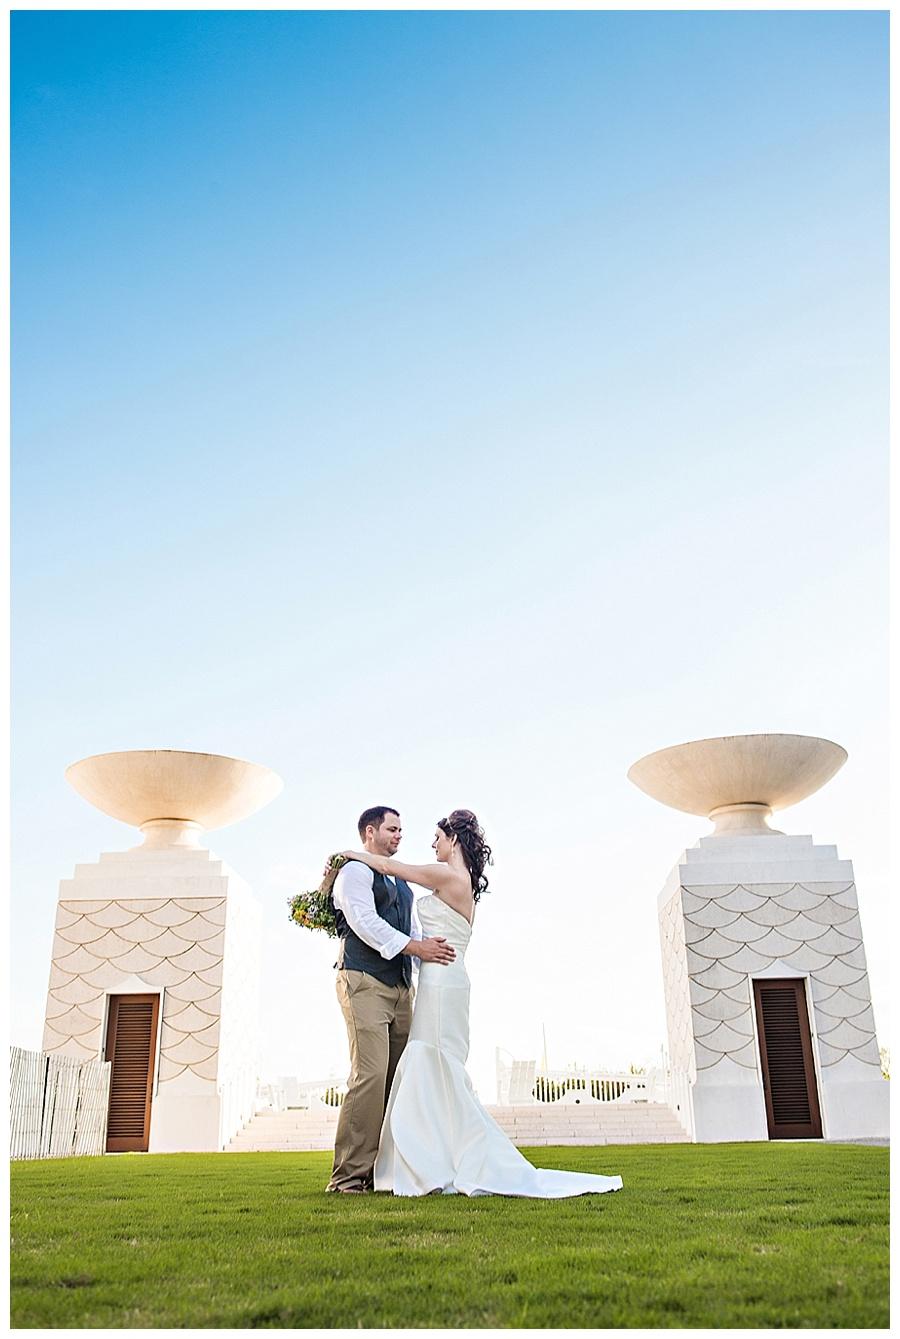 Lindsey And Ryan An Alys Beach Fonville Press Wedding 30a Co